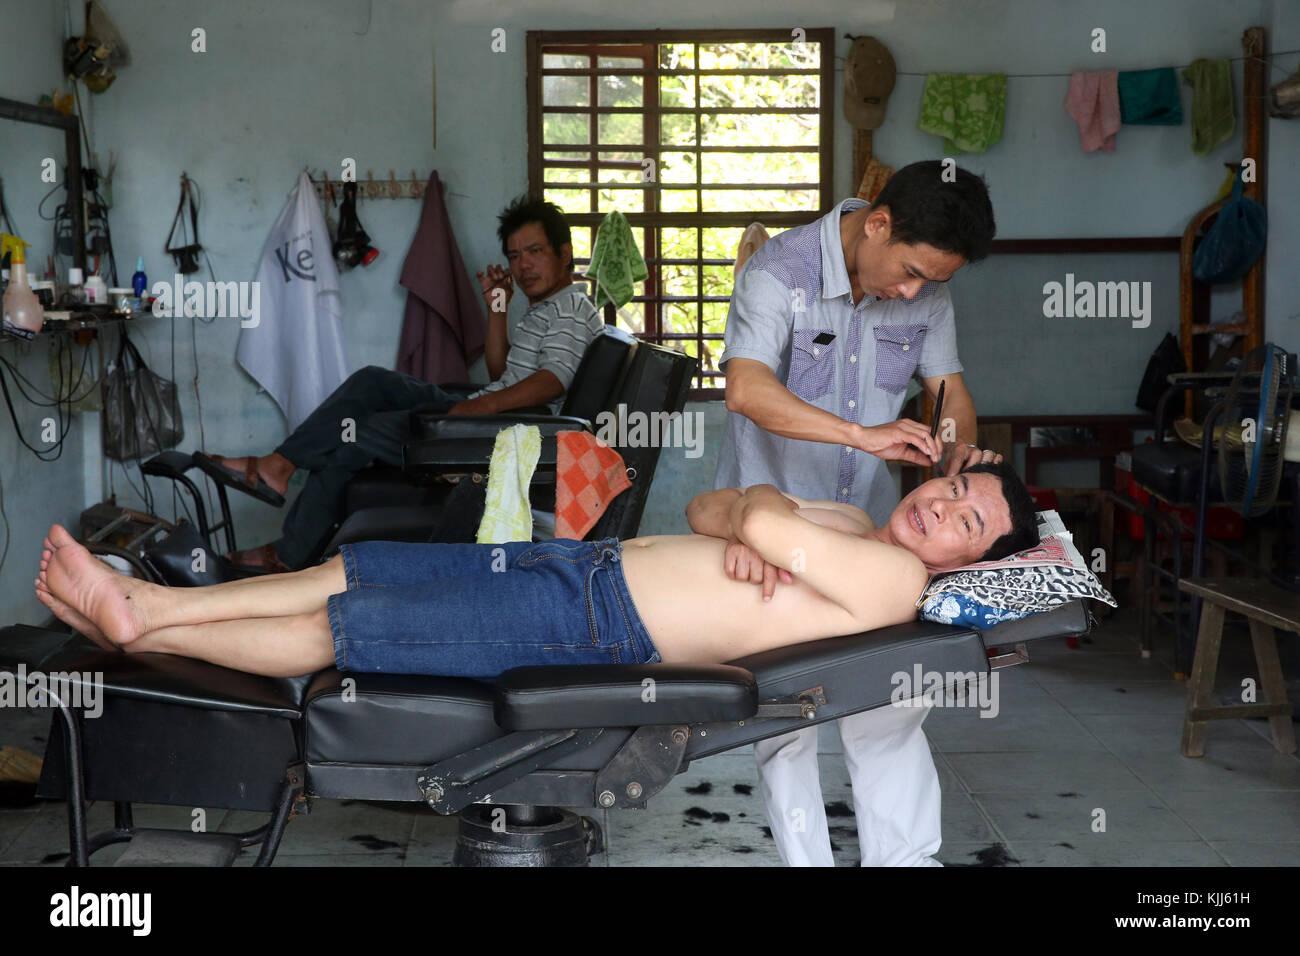 Parrucchiere. Barbiere cliente di rasatura. Hoi An. Il Vietnam. Immagini Stock